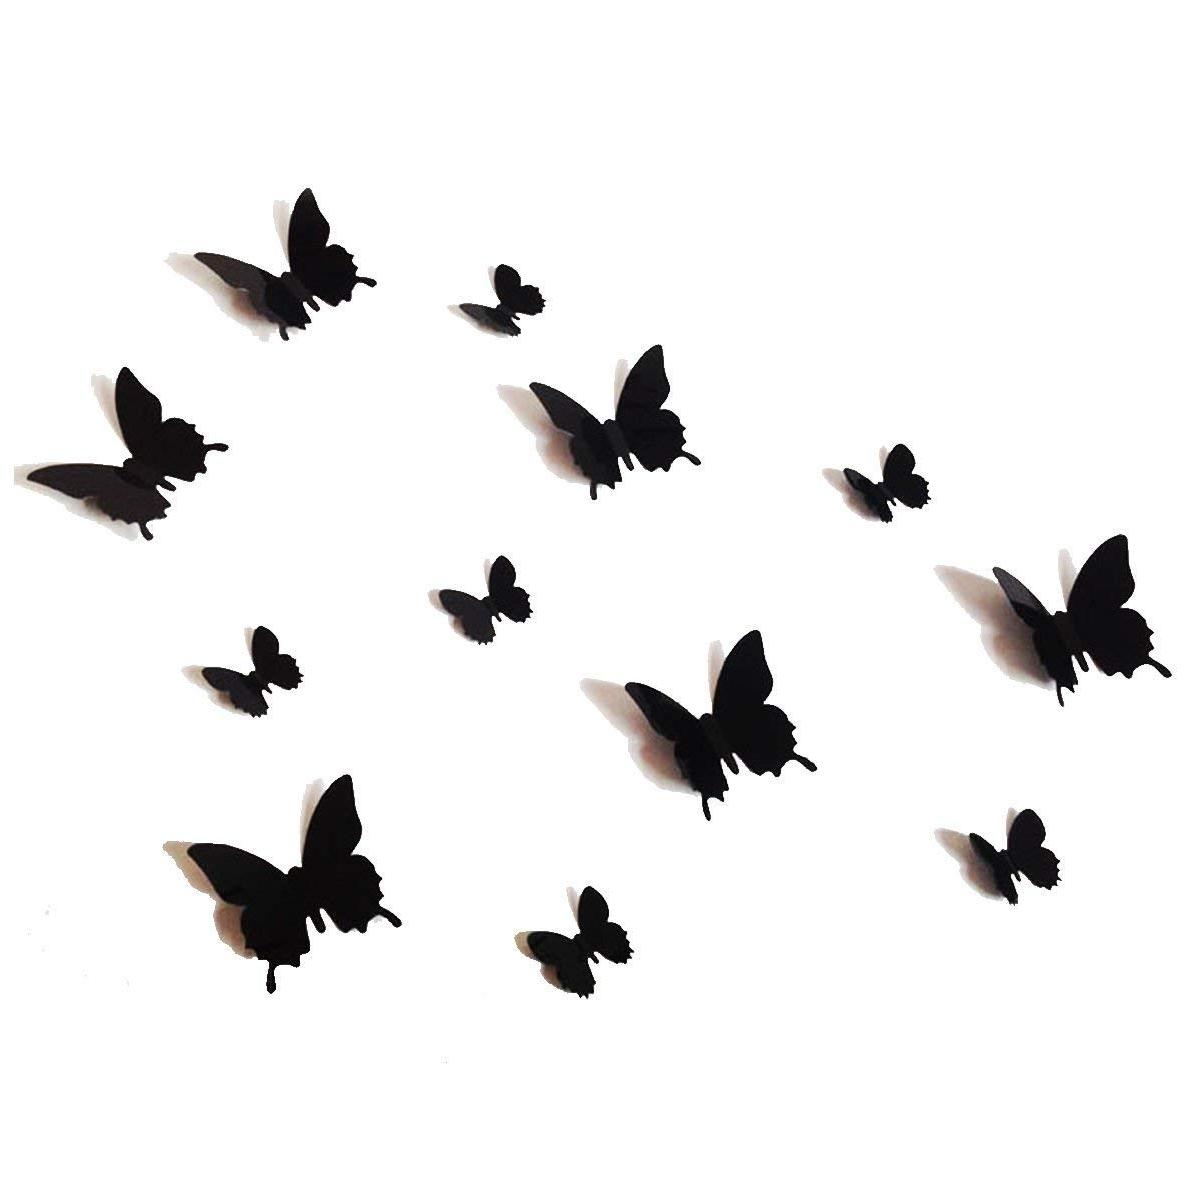 Butterfly Wall Art Regarding Well Known 12Pcs 3D Black Butterfly Wall Stickers Art Decal Pvc Butterflies (View 11 of 15)